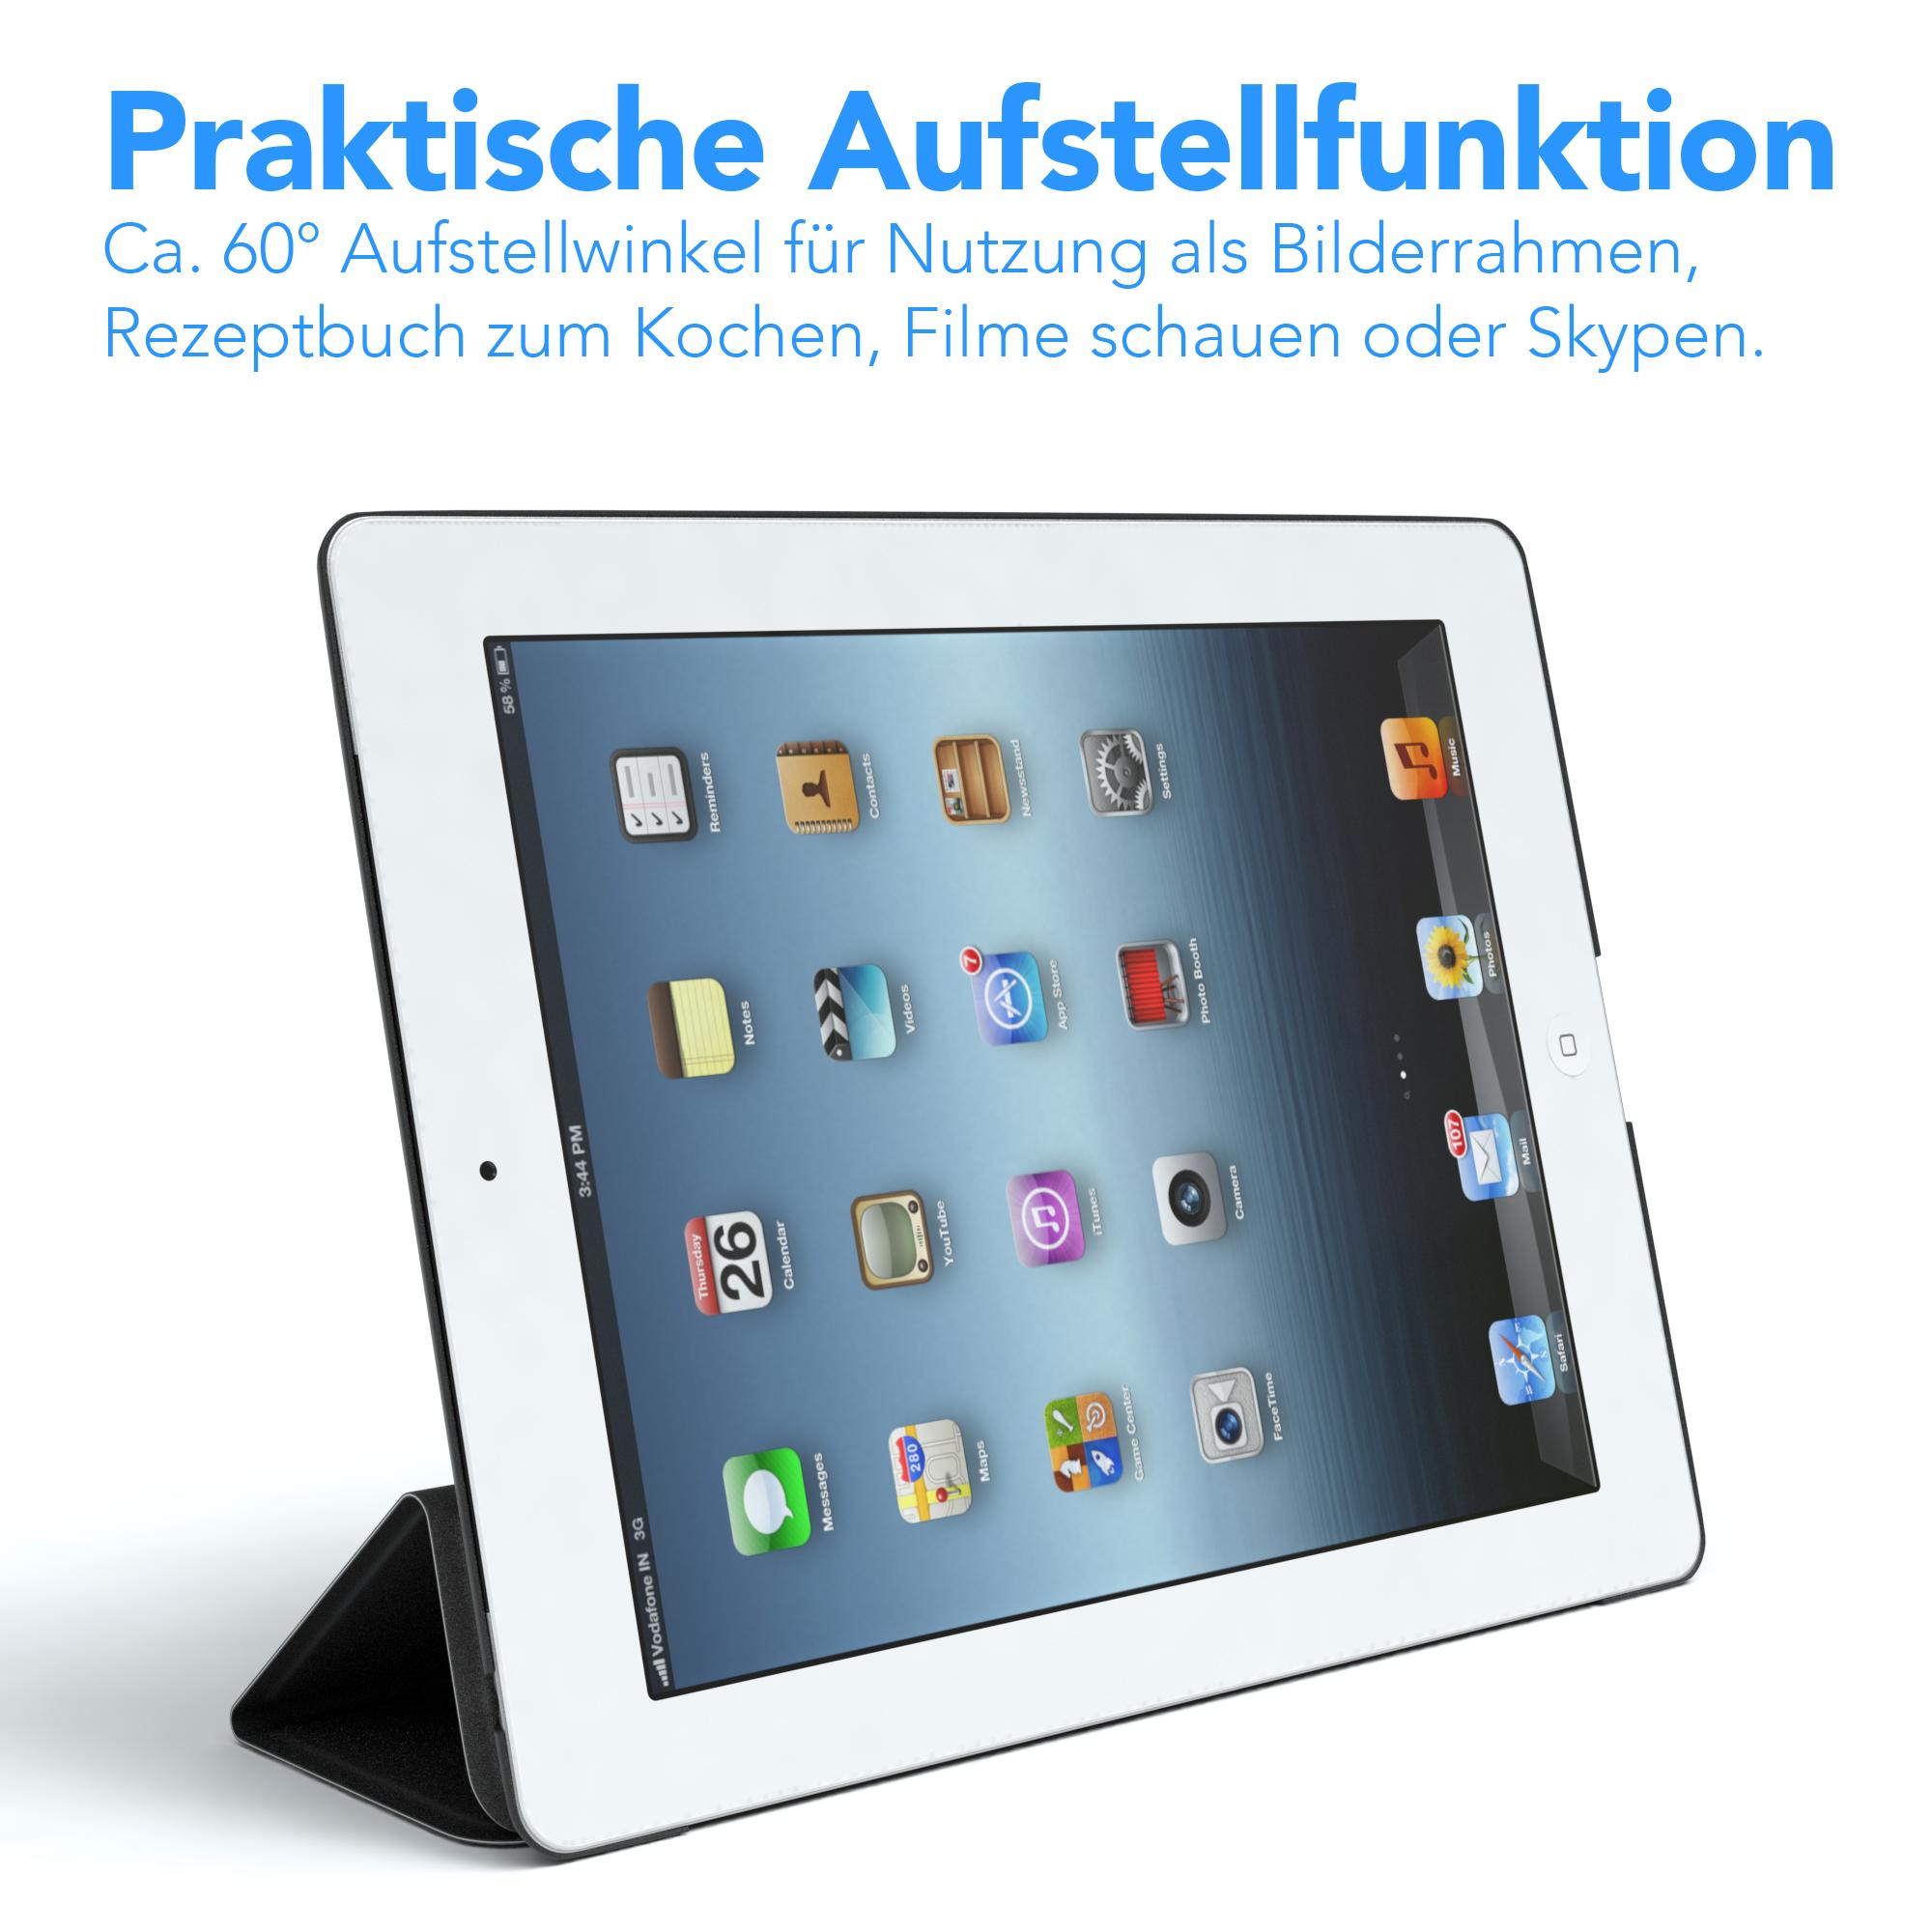 ipad 4 ipad 3 ipad 2 smart case cover schutz h lle etui. Black Bedroom Furniture Sets. Home Design Ideas